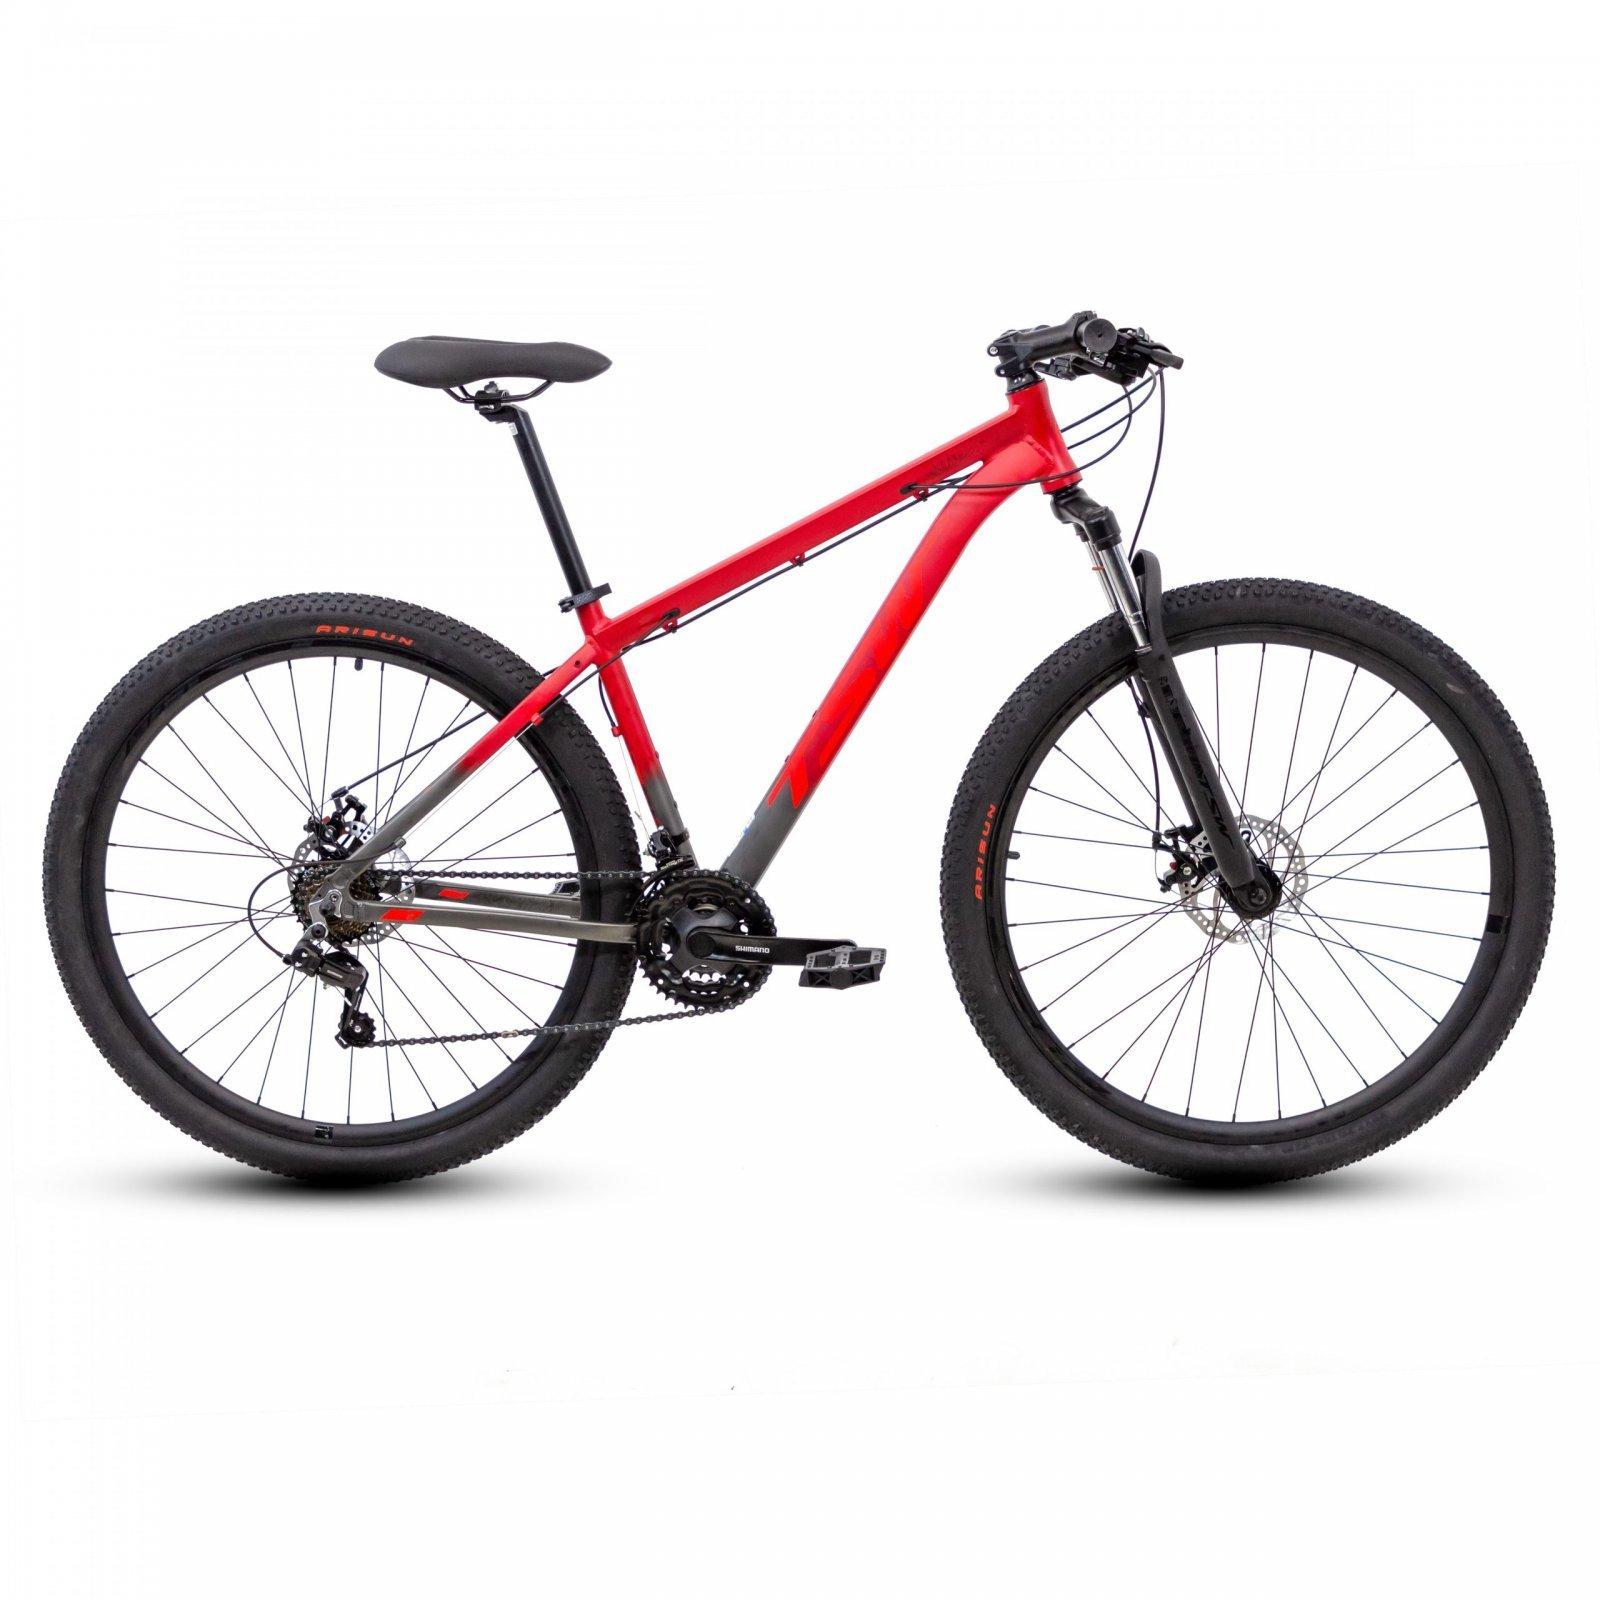 Bicicleta TSW Ride Disc Aro 29 21 vel